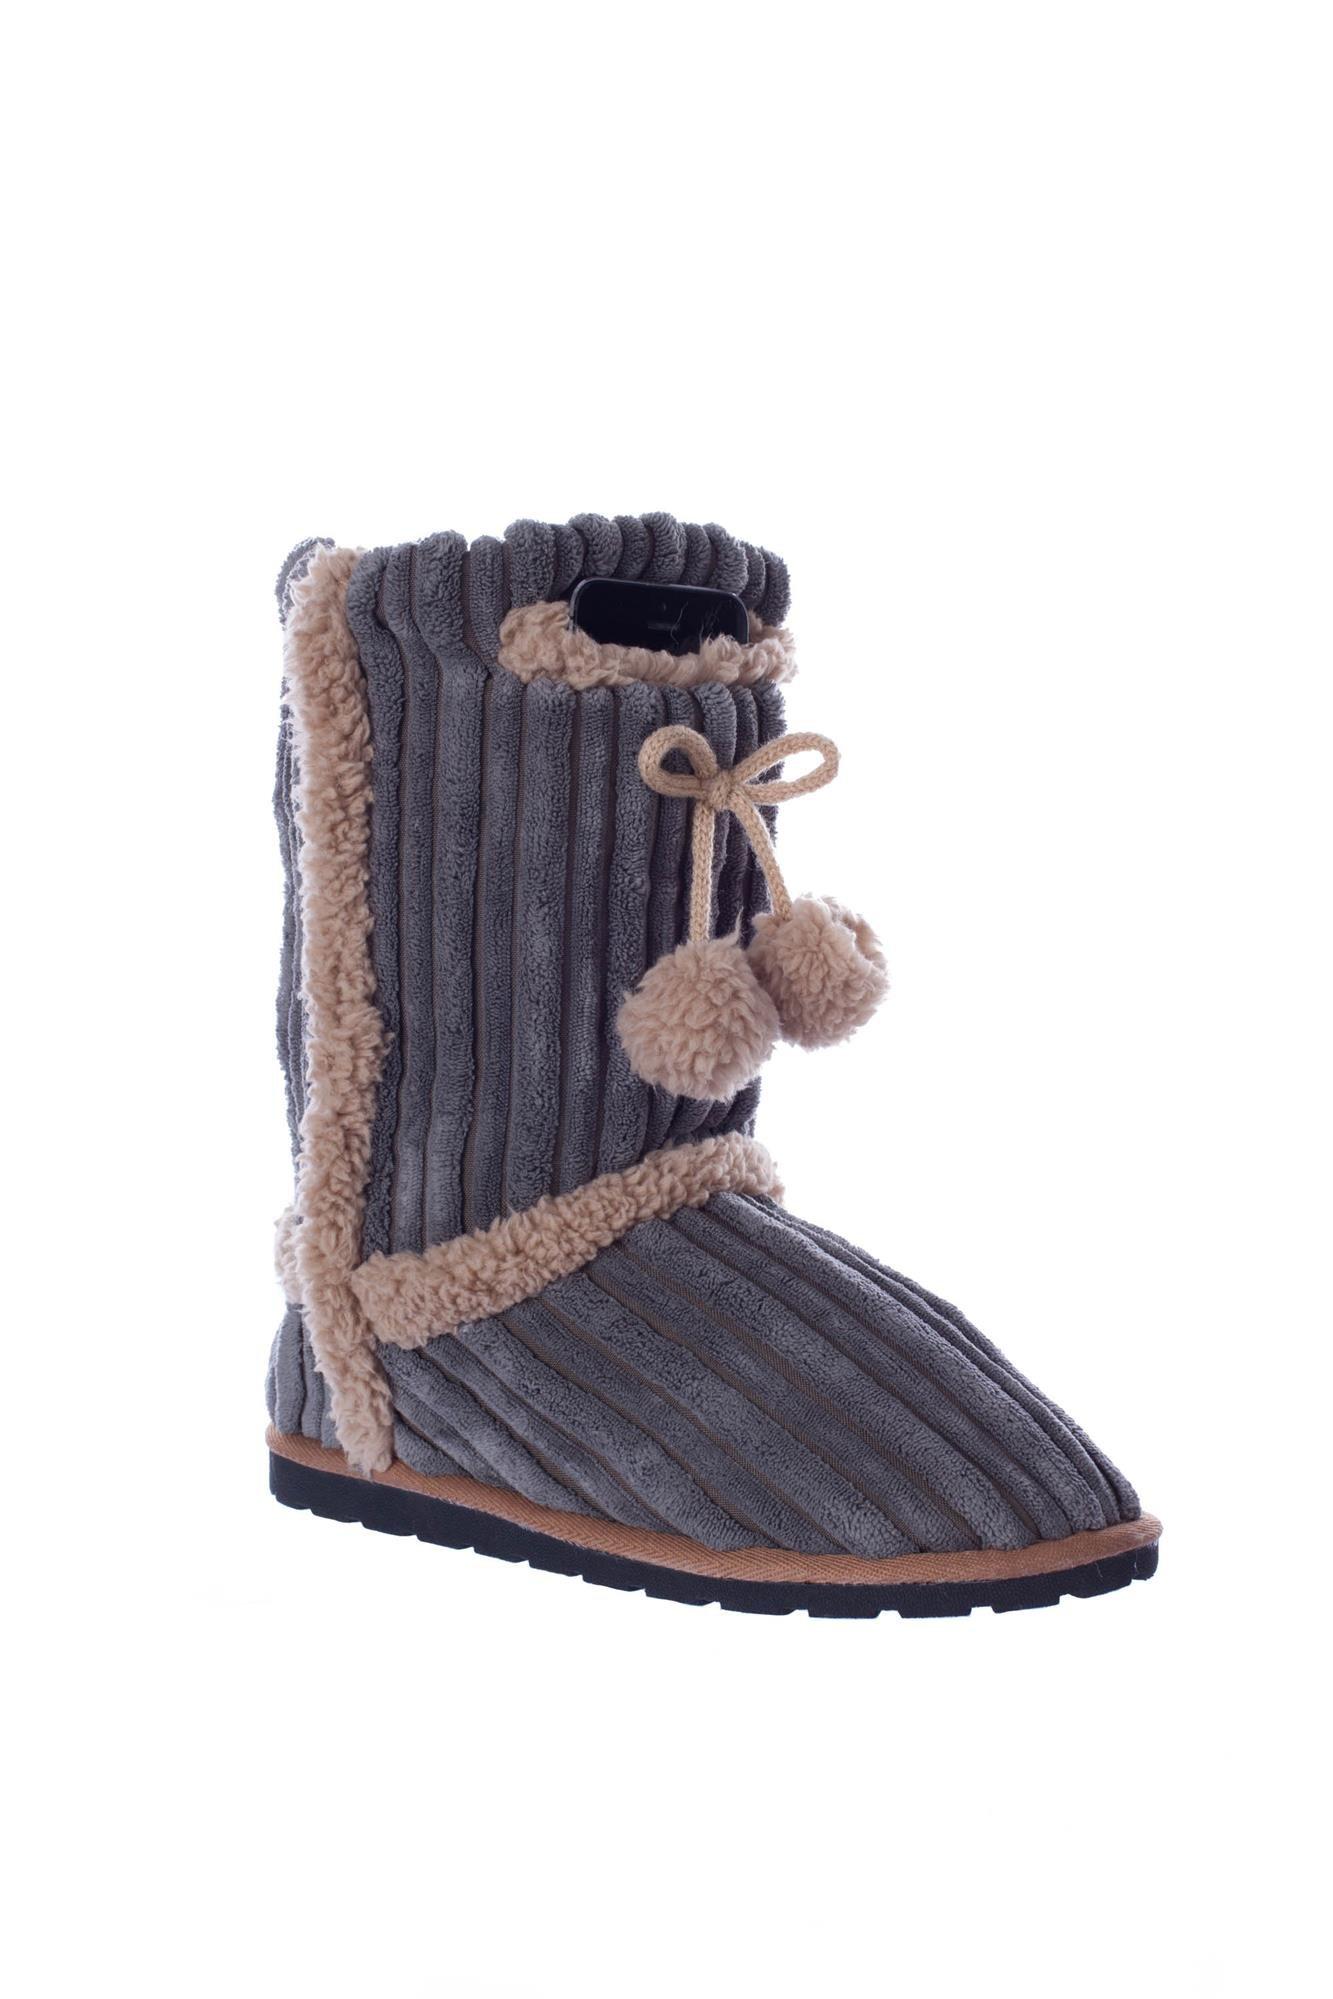 Outdoor Fuzzy Slipper Socks Boot Hard Bottom Phone Pocket CGrey Cord Large by MinxNY